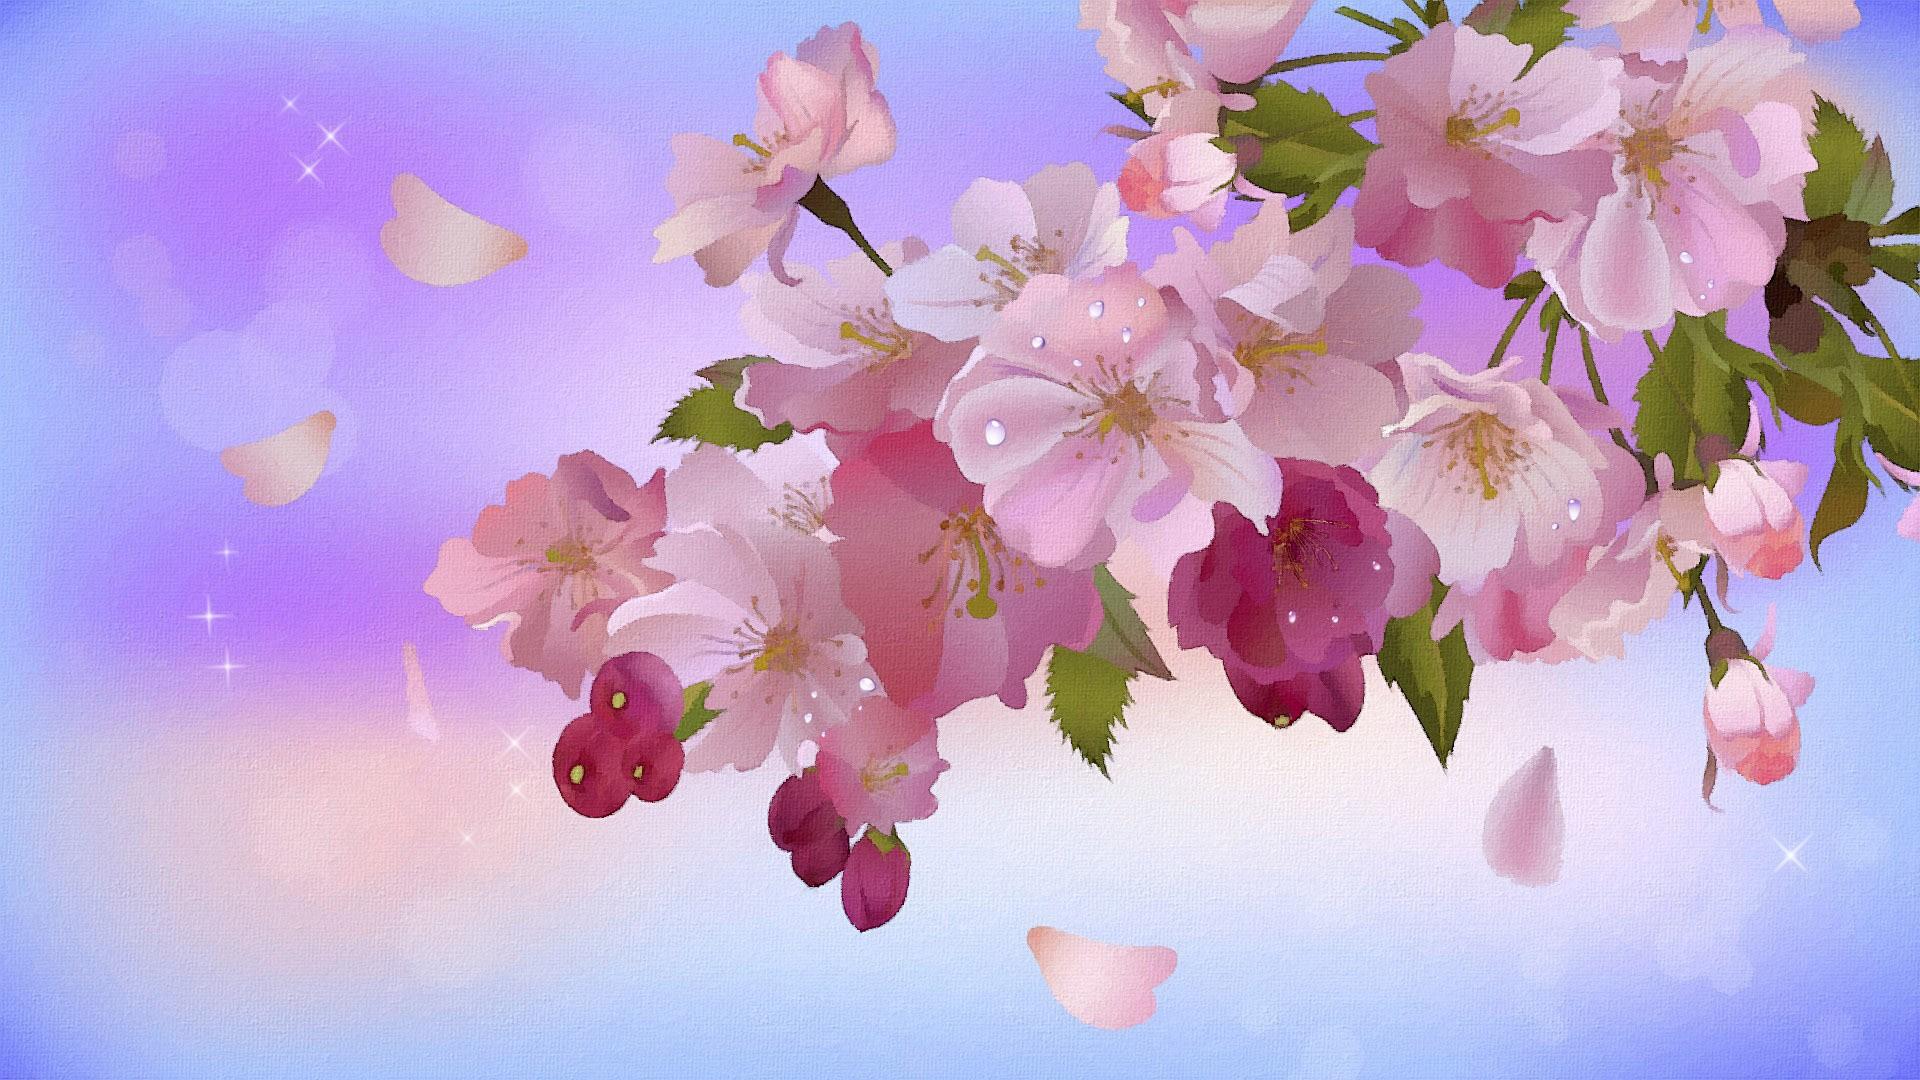 Una pintura de flores - 1920x1080